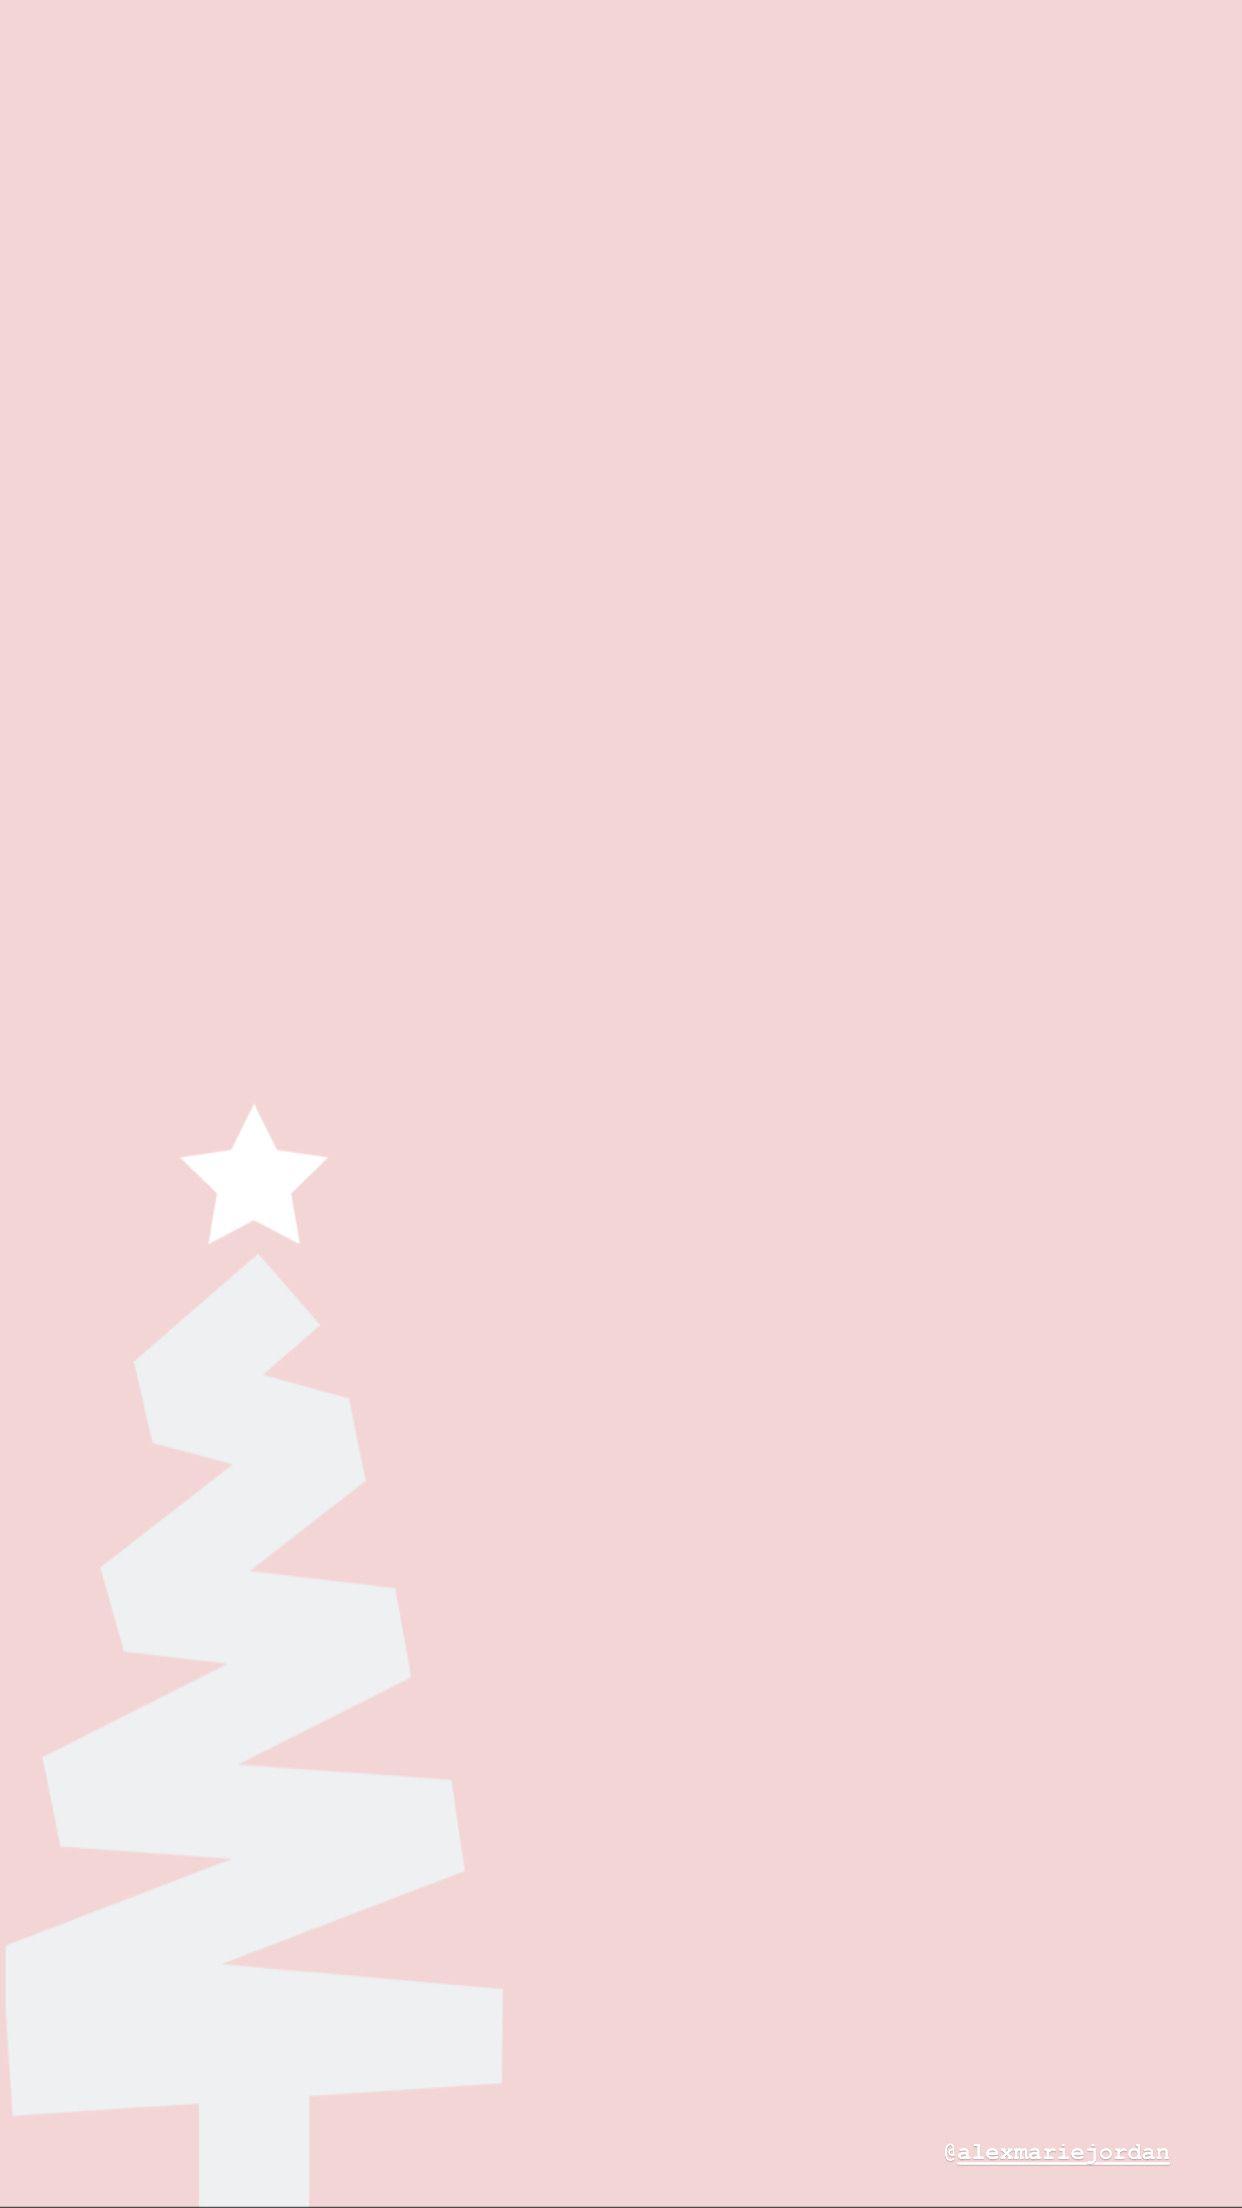 Pink Christmas Tree Wallpaper Cute Christmas Wallpaper Wallpaper Iphone Christmas Christmas Phone Wallpaper